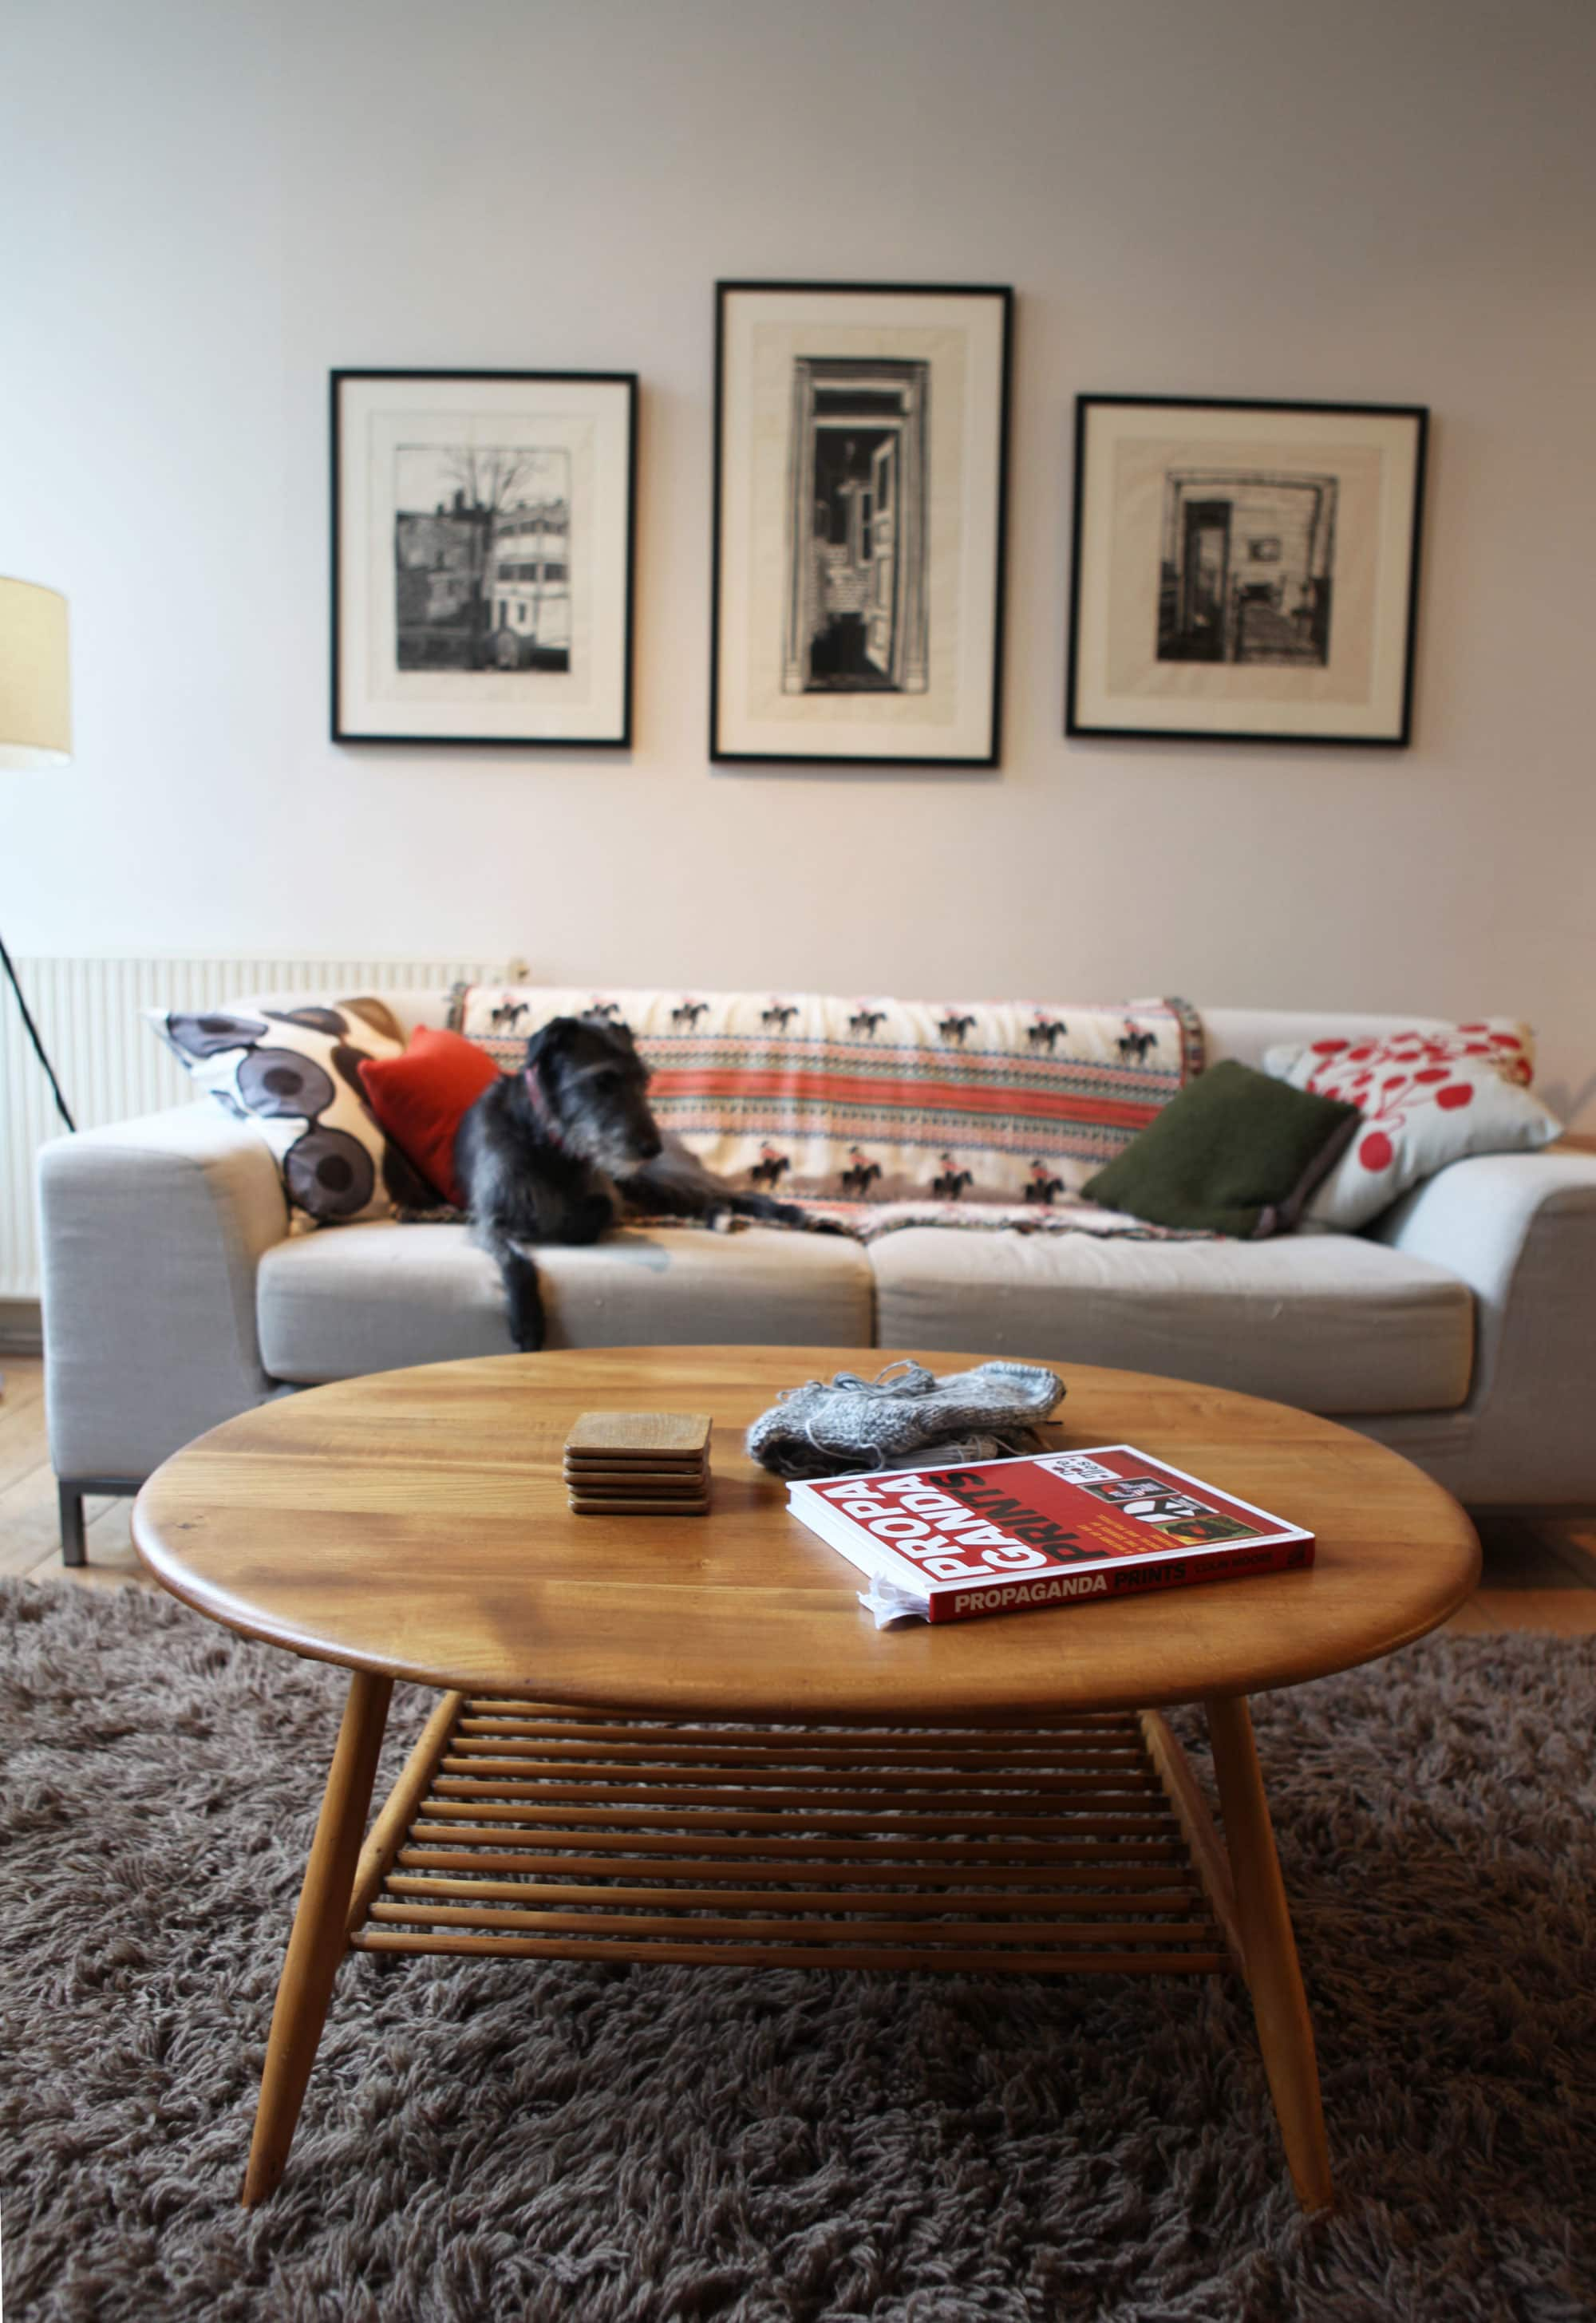 Lesley's Cozy Cool UK Coastal Home: gallery image 8